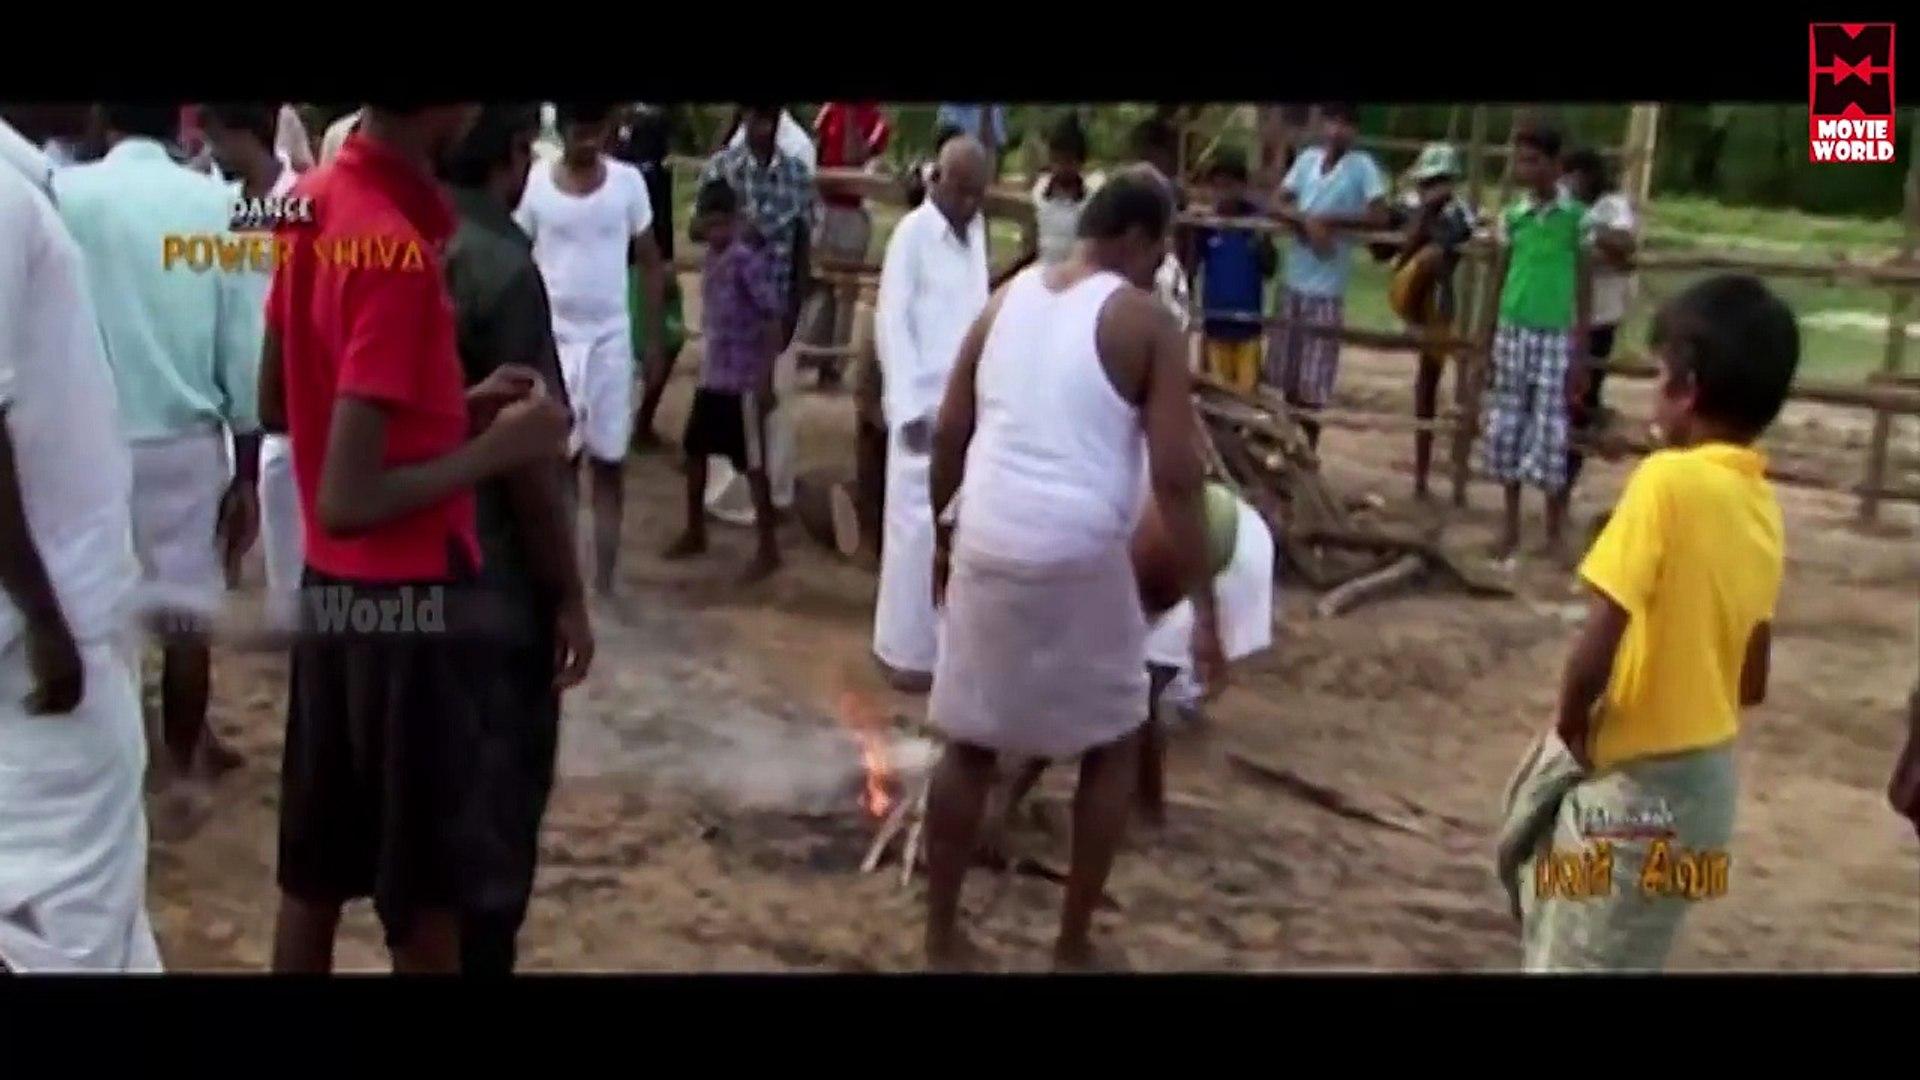 Tamil Movies 2014 - Asaivam - Part - 1 [HD]